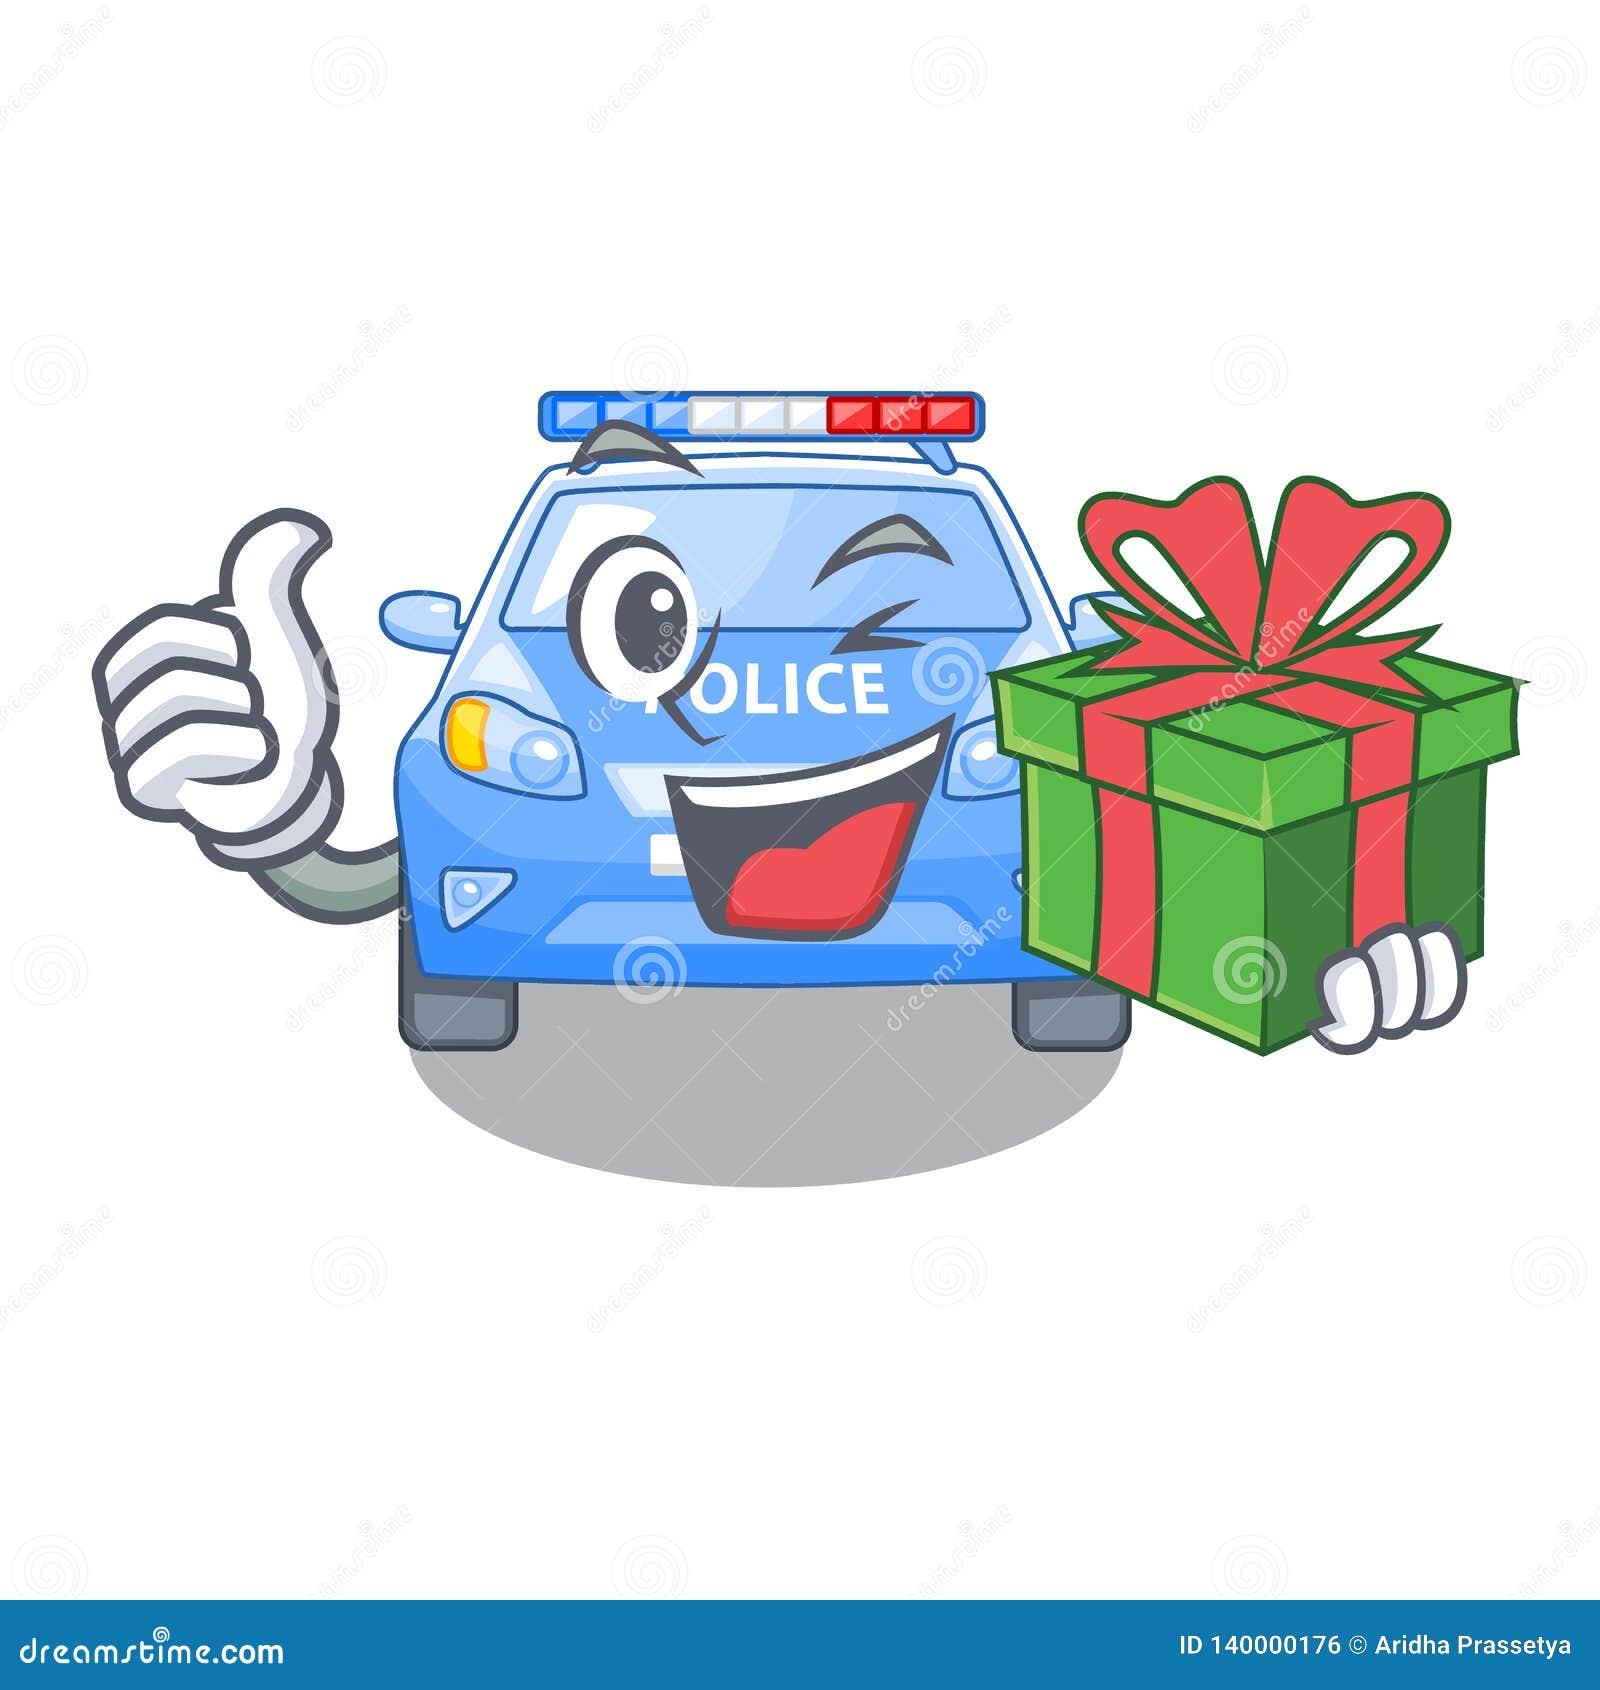 With Gift Miniature Cartoon Police Car On Table Stock Vector